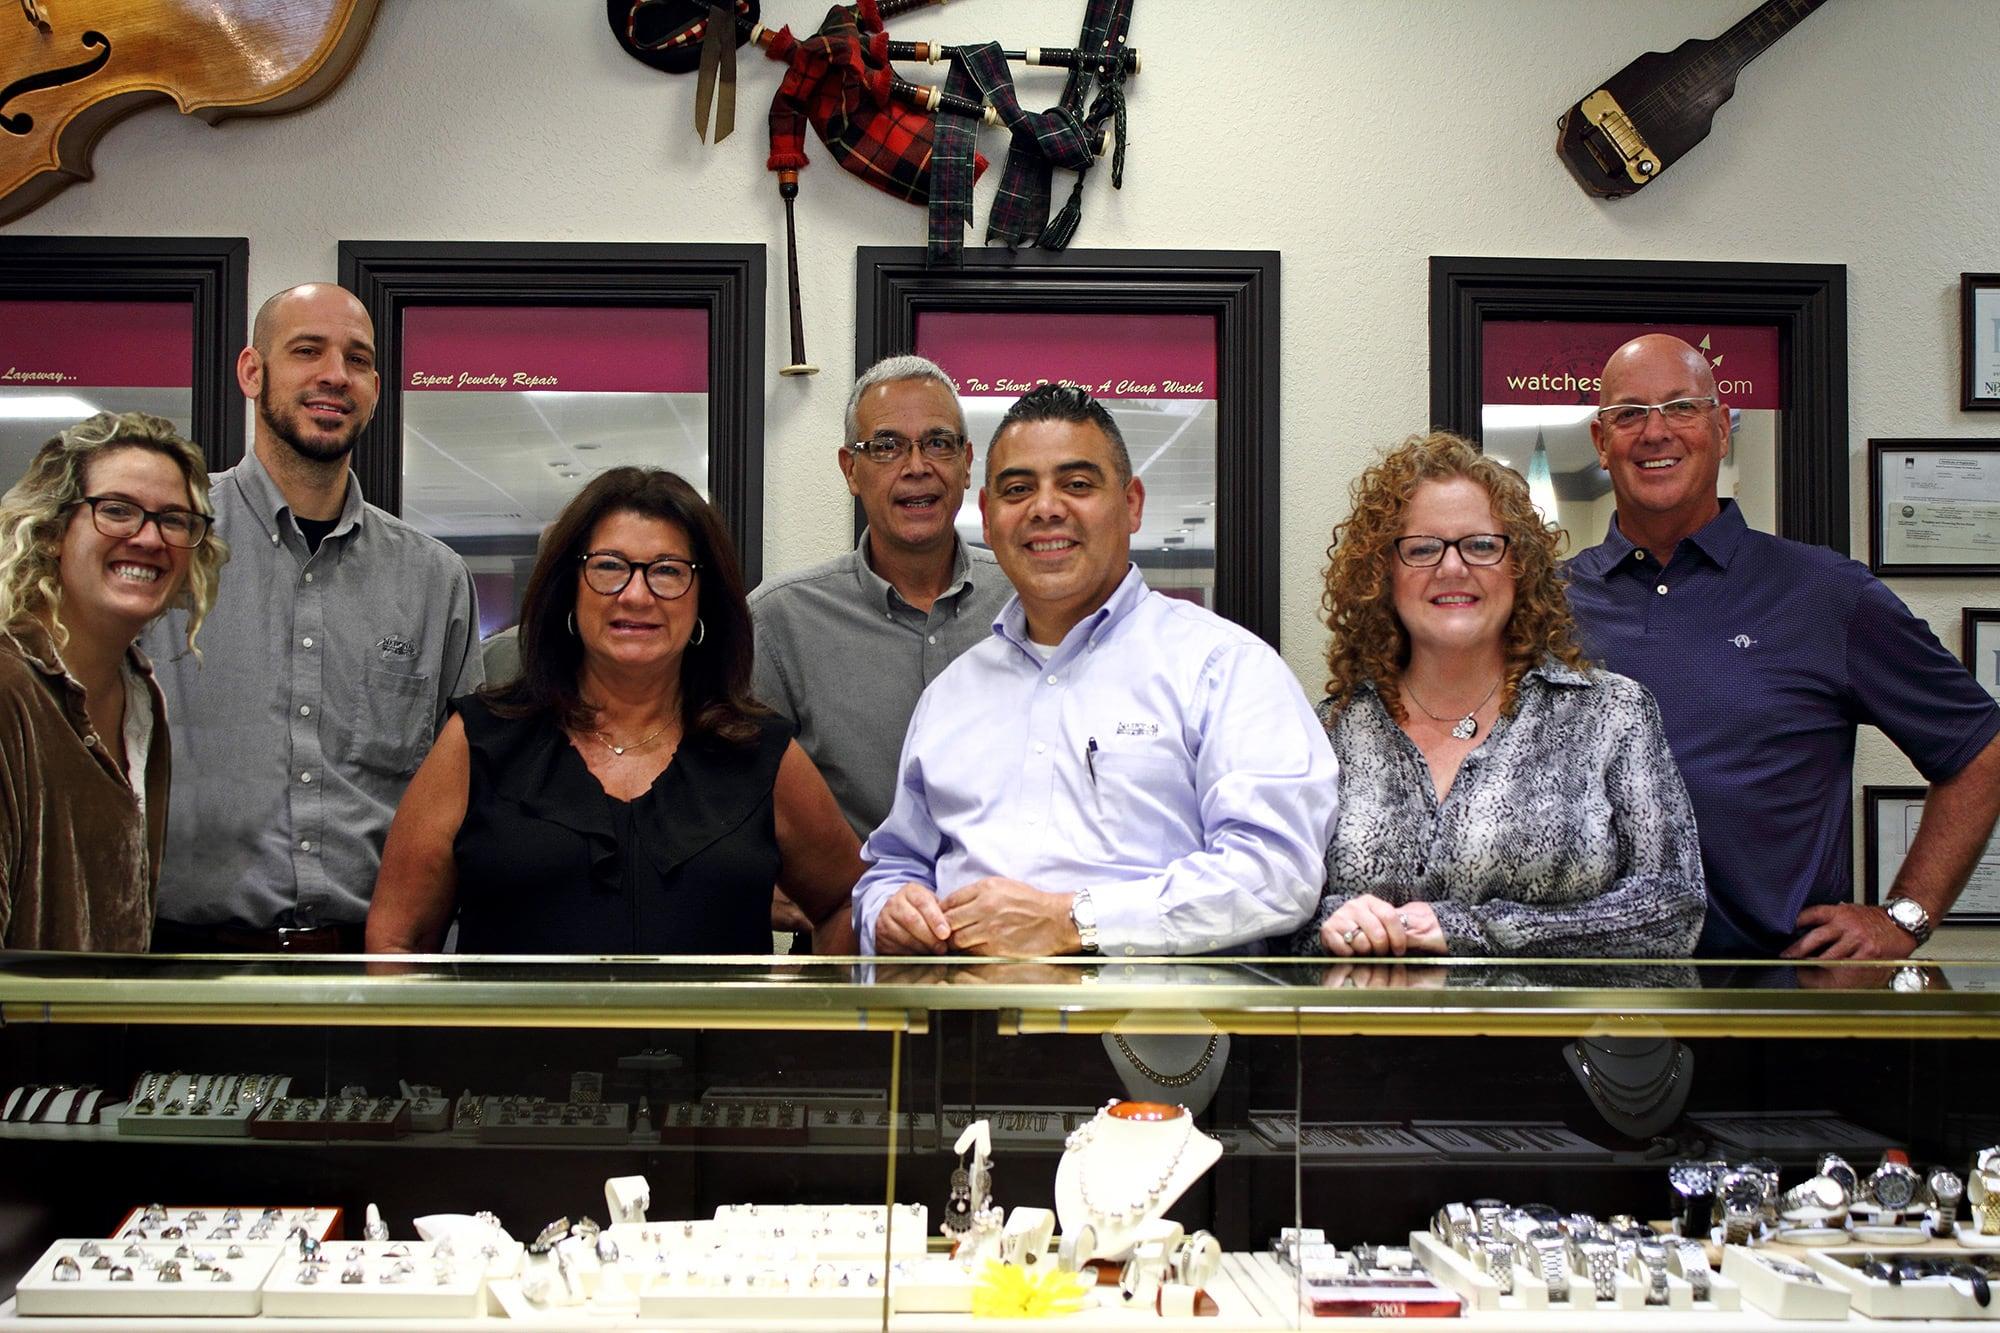 National Pawn & Jewelry staff photo